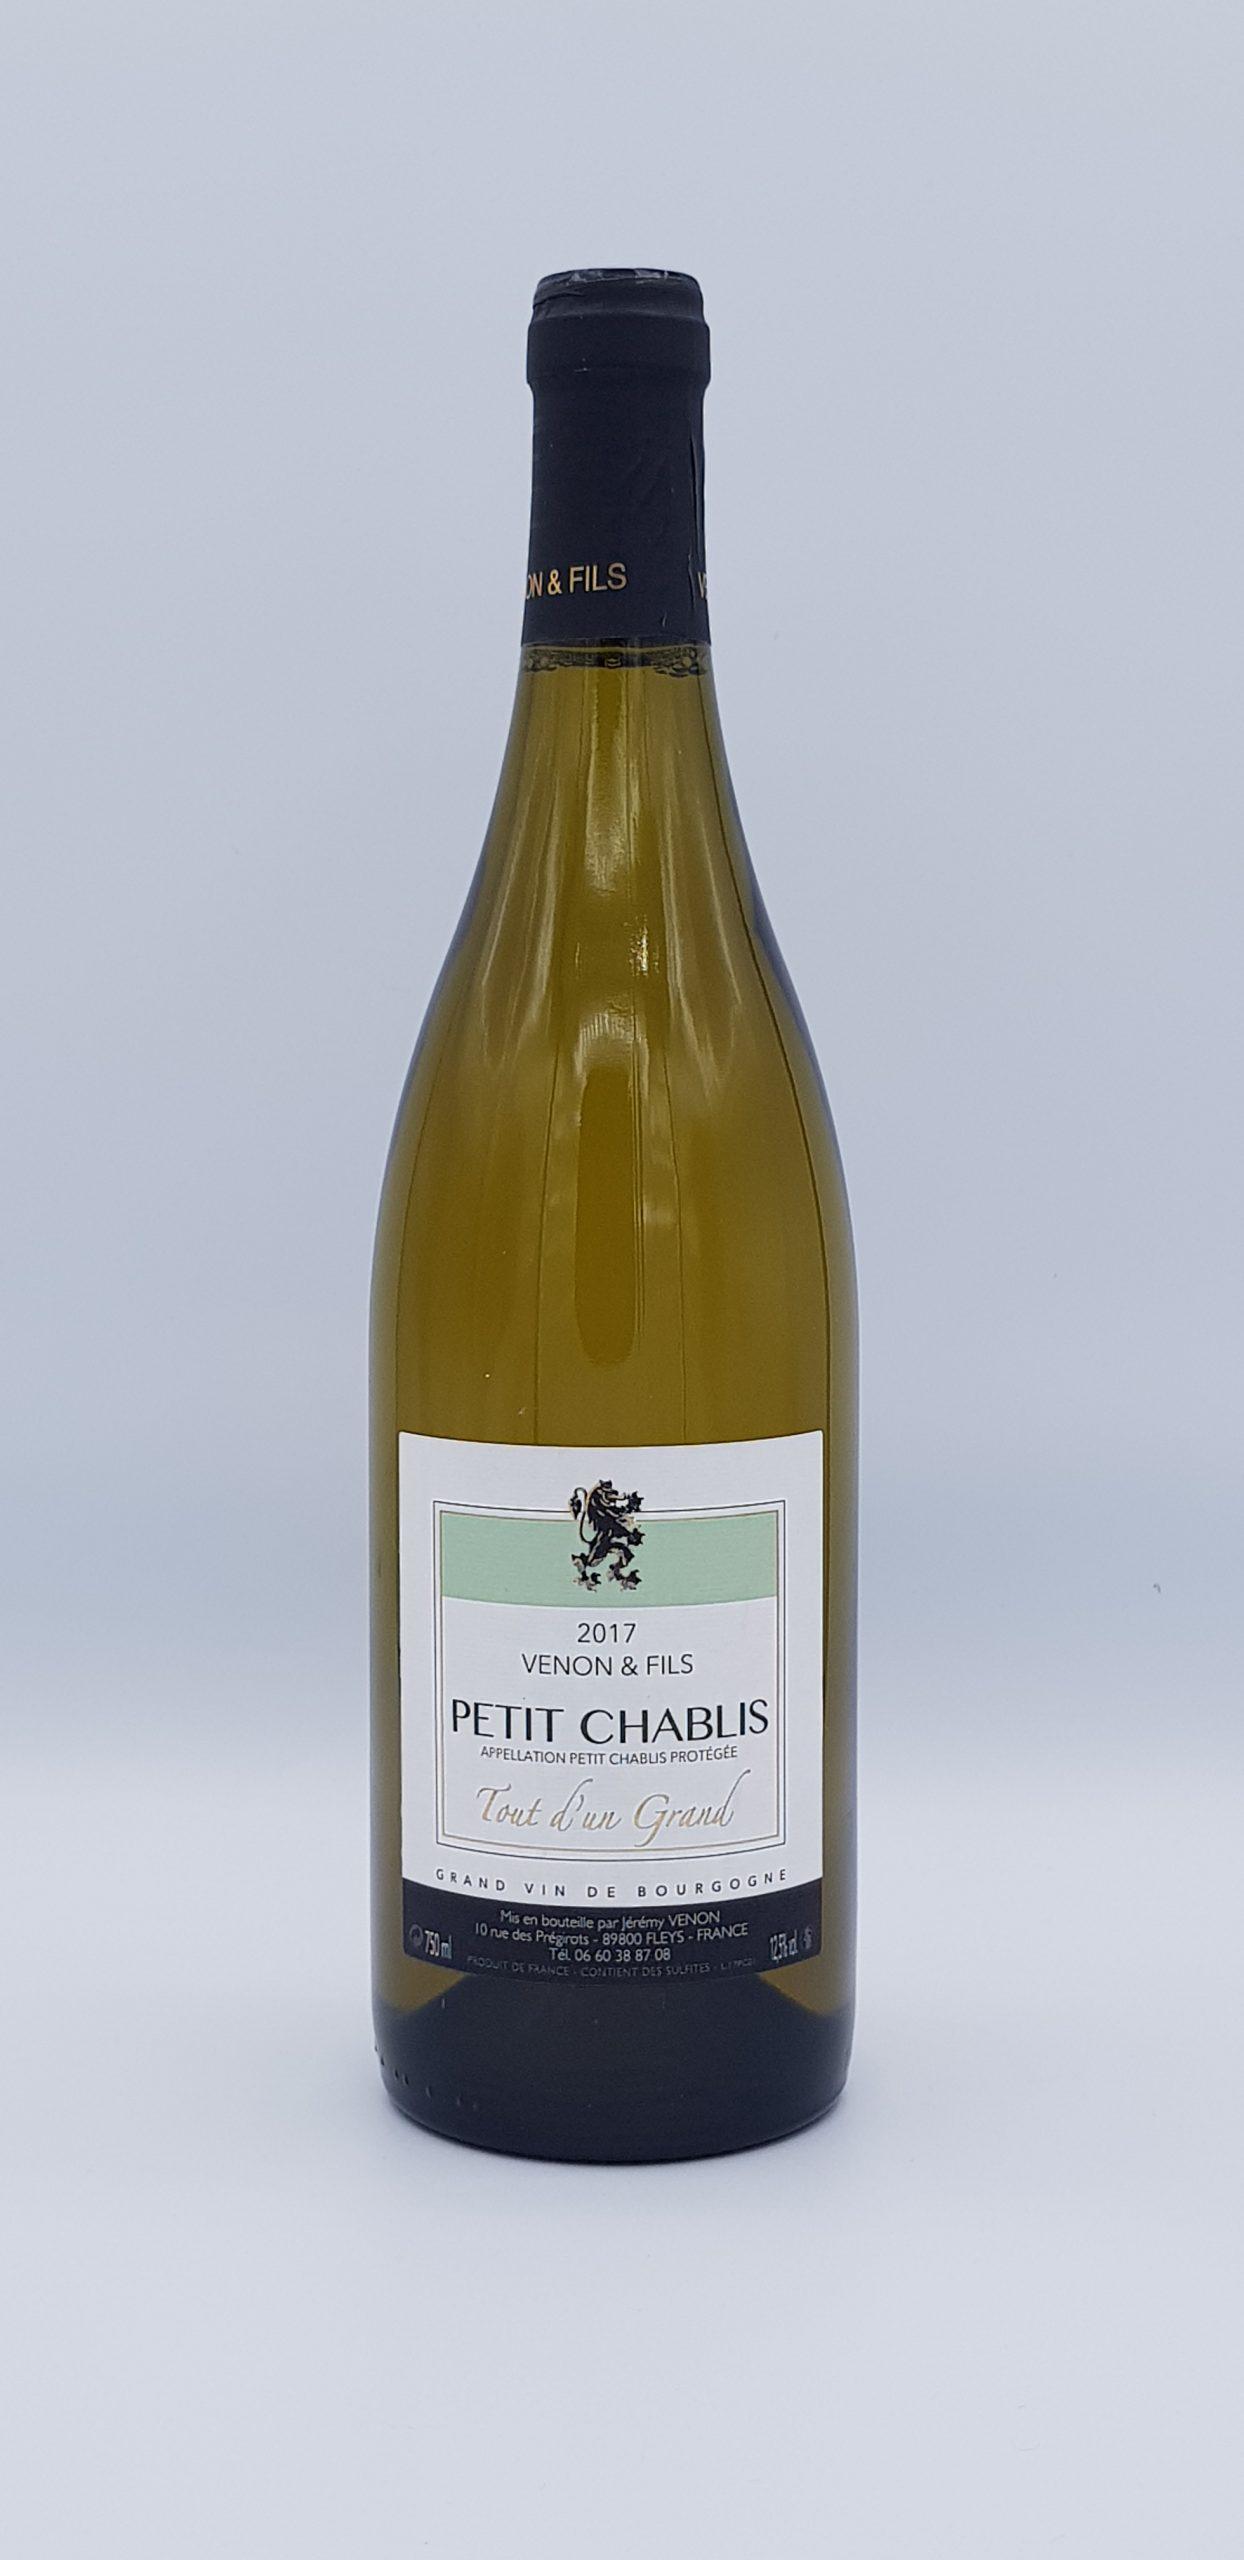 Bourgogne Petit Chablis 2017